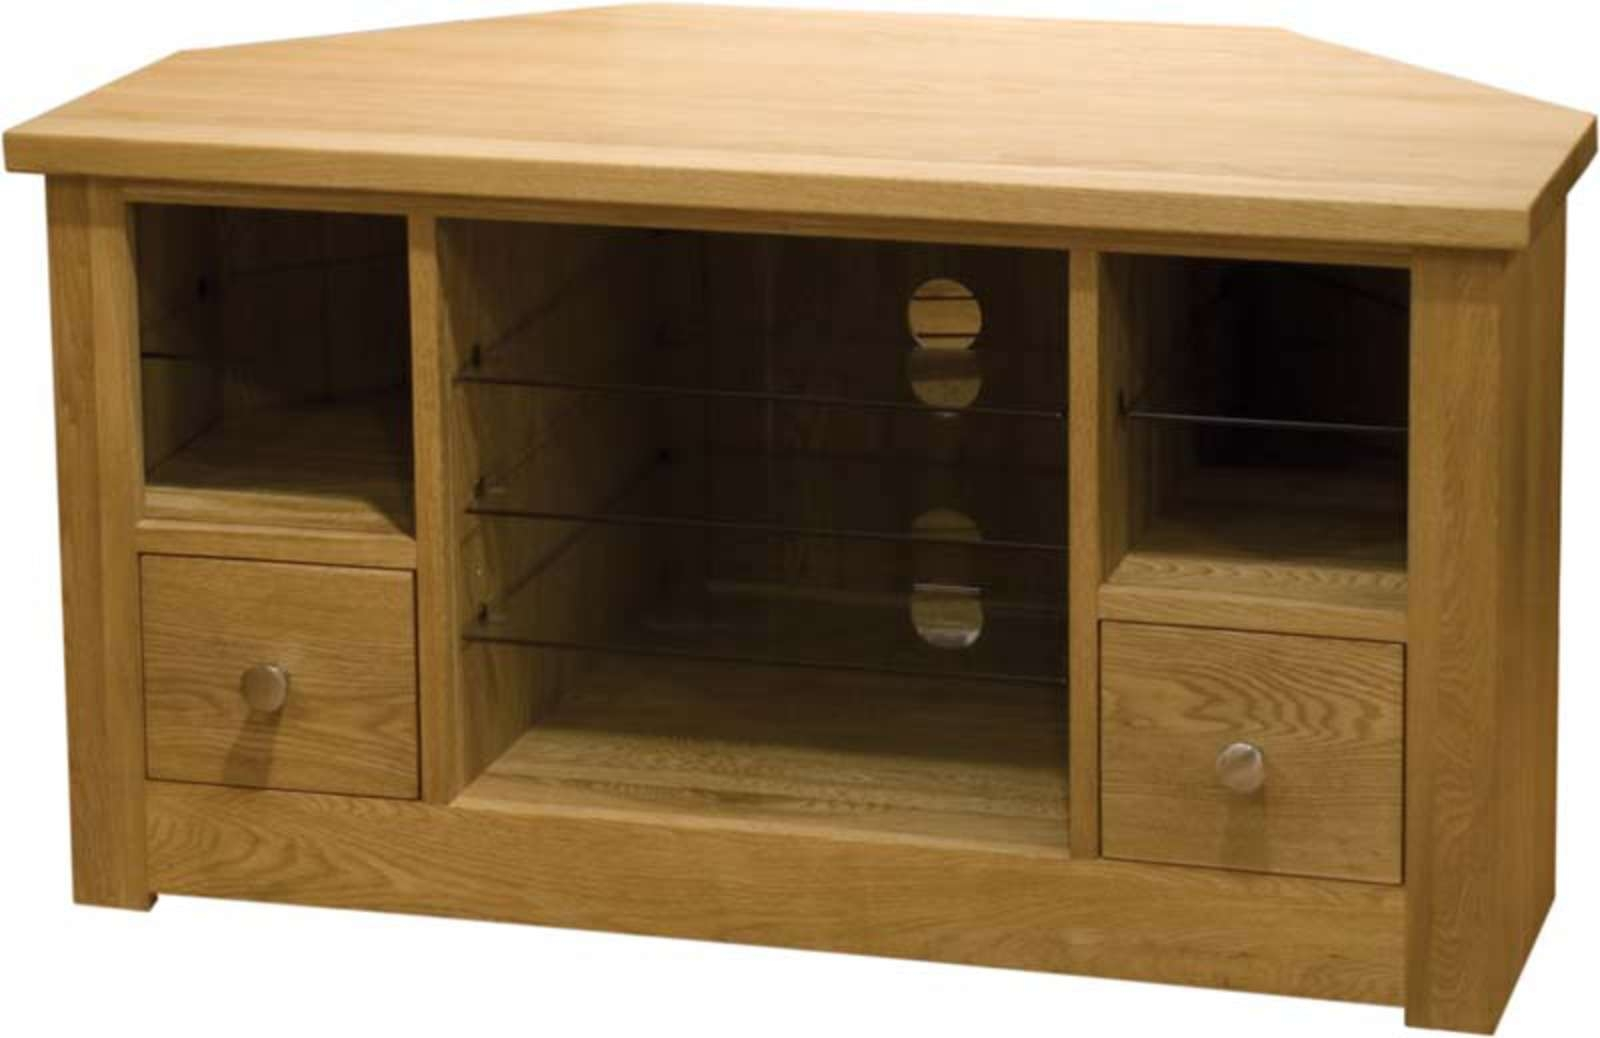 Oak Corner Tv Unit – Pine, Oak, Painted And Bespoke Furniture In Painted Corner Tv Cabinets (Gallery 18 of 20)